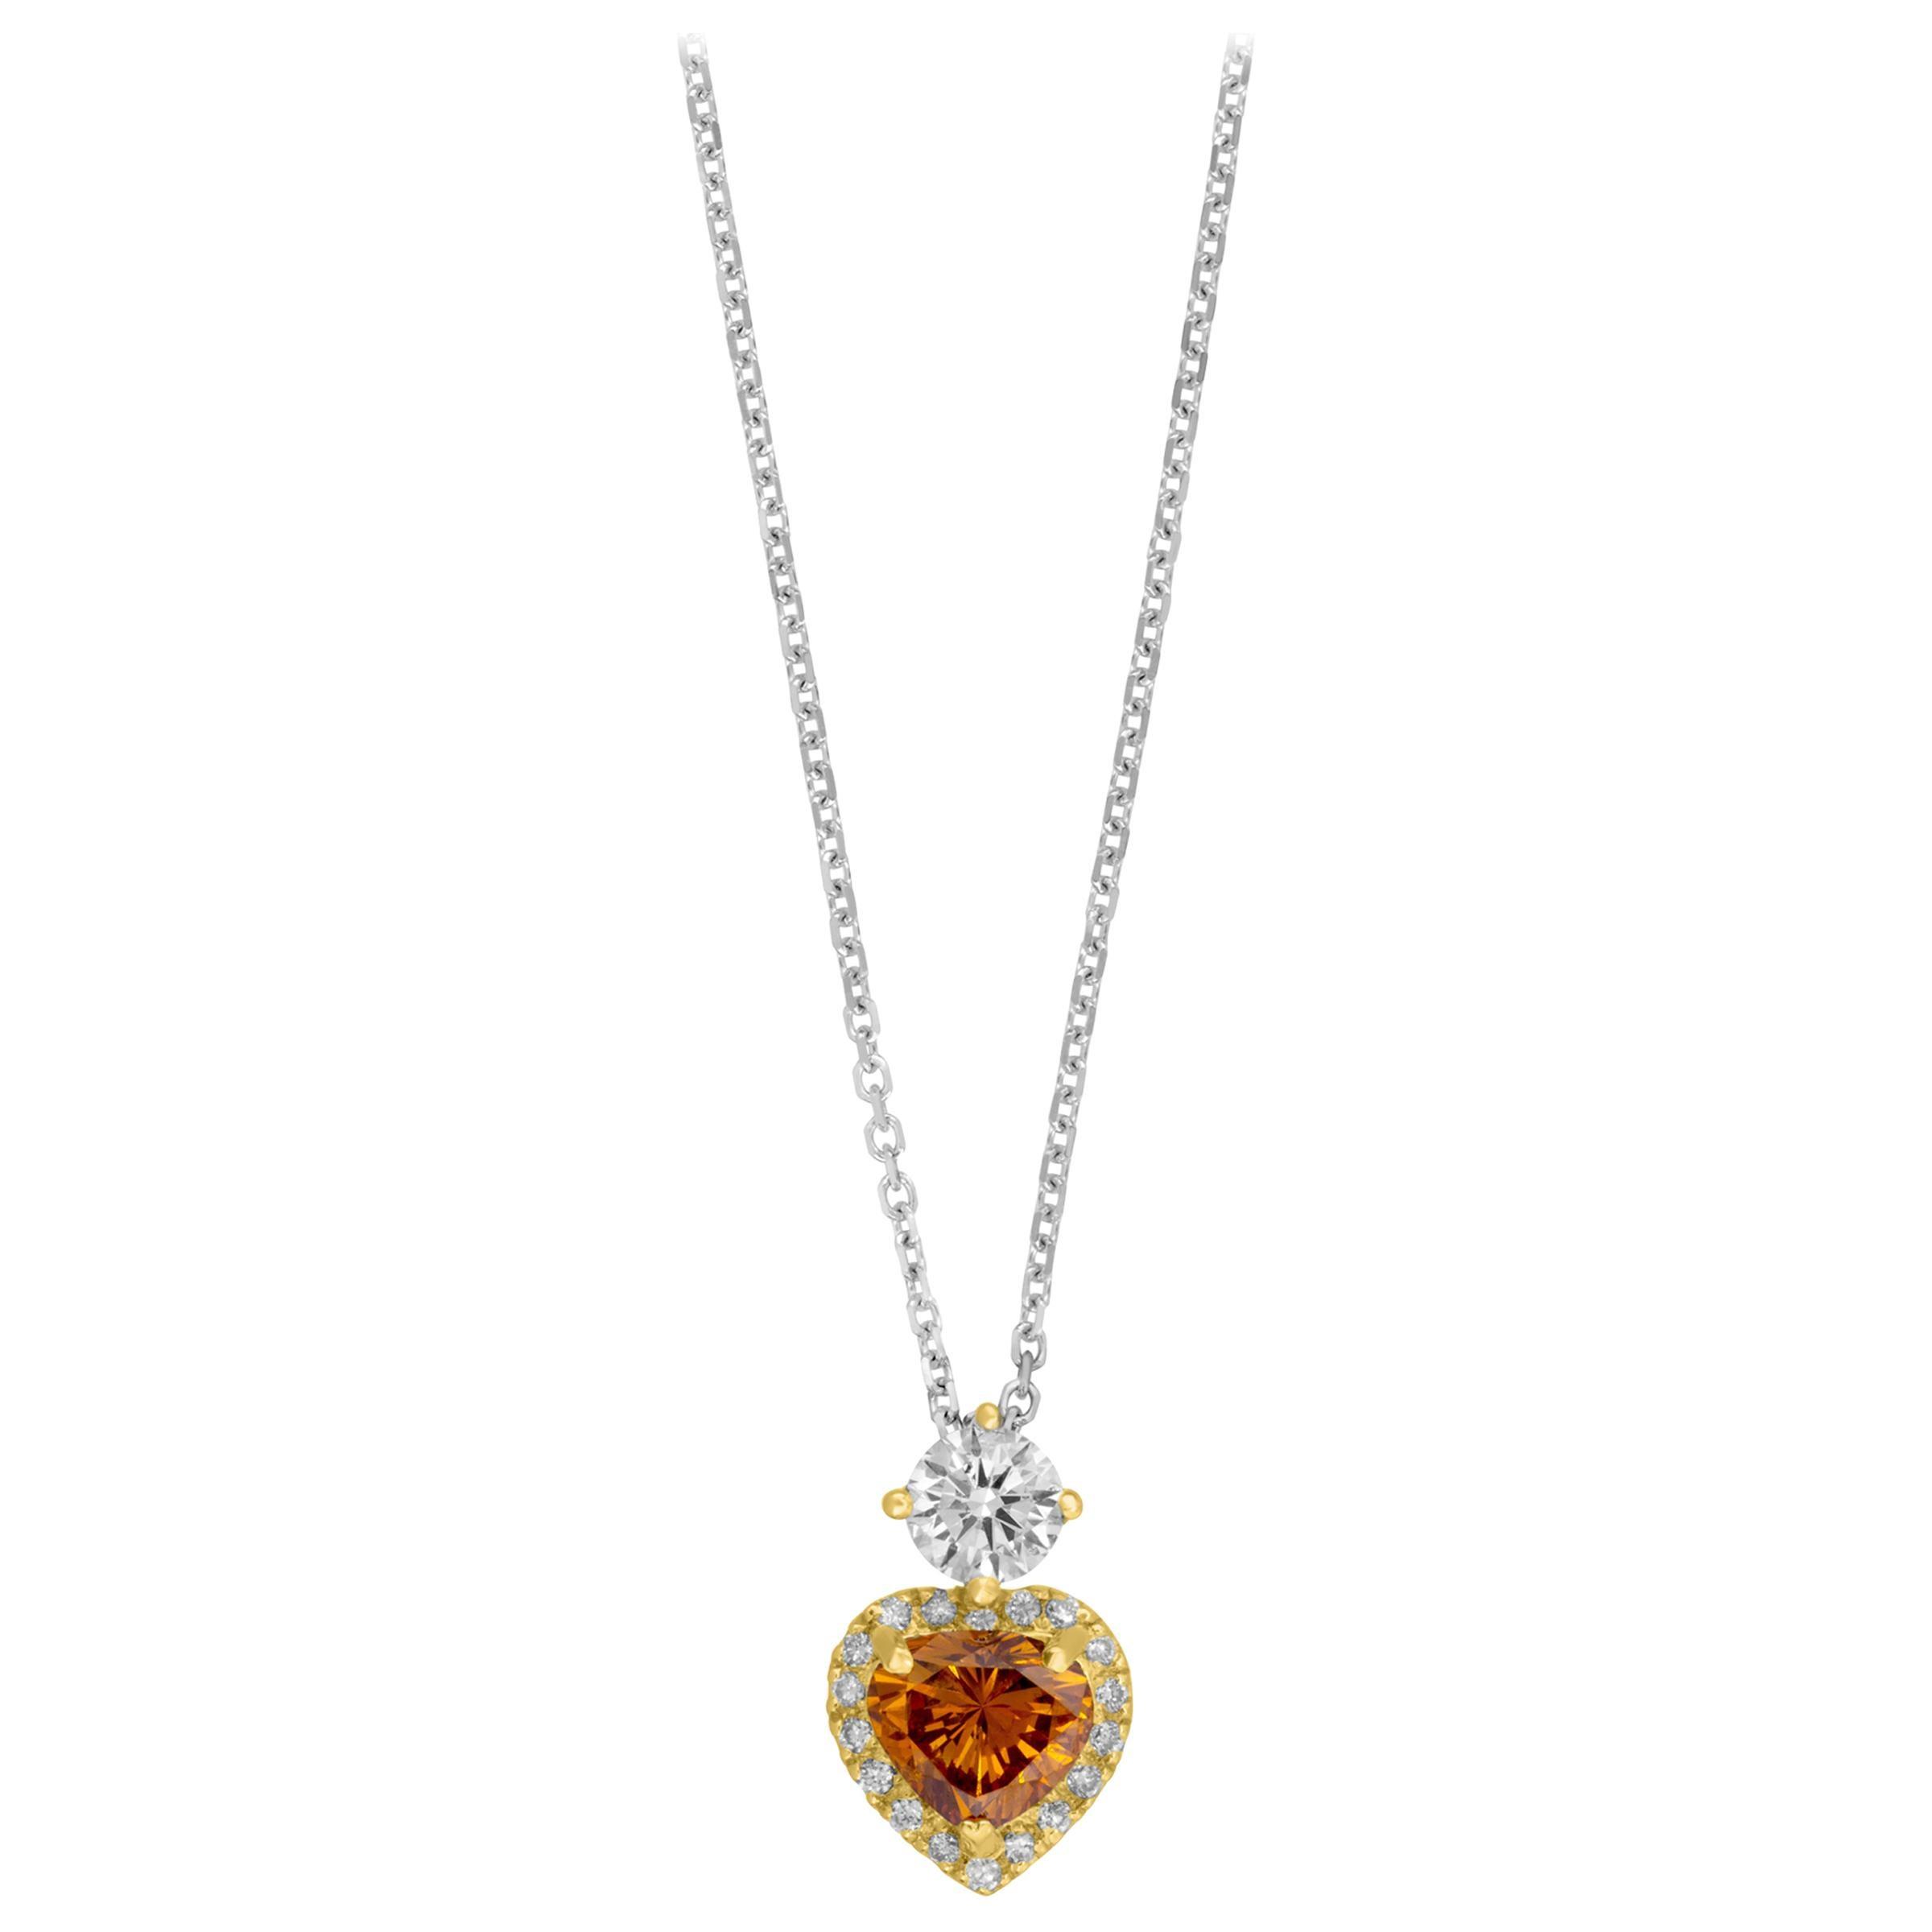 Brown Diamond Heart Pendant 0.31 Carat